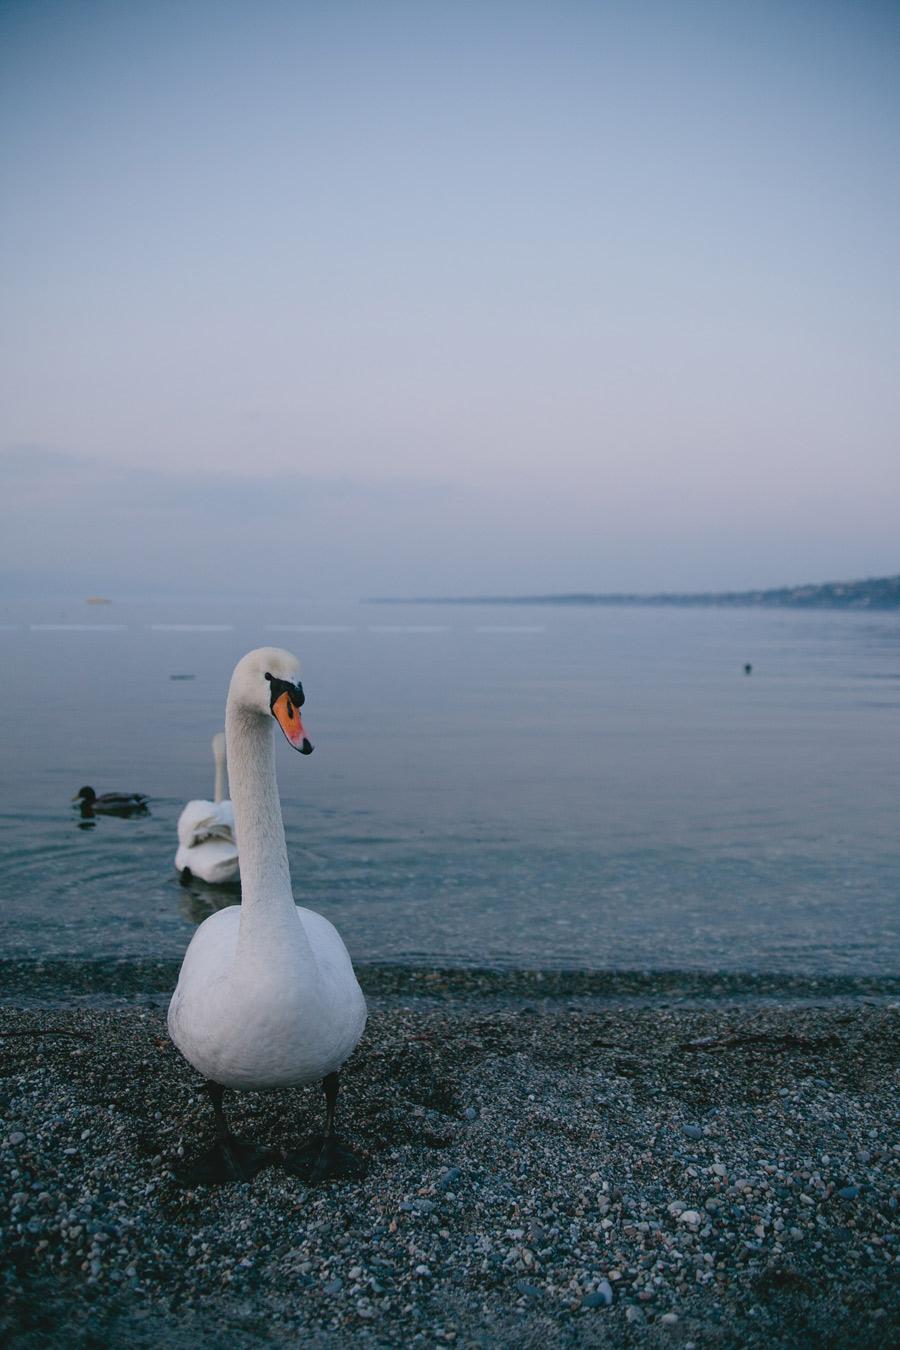 white-swan-on-shore-of-lake-geneva